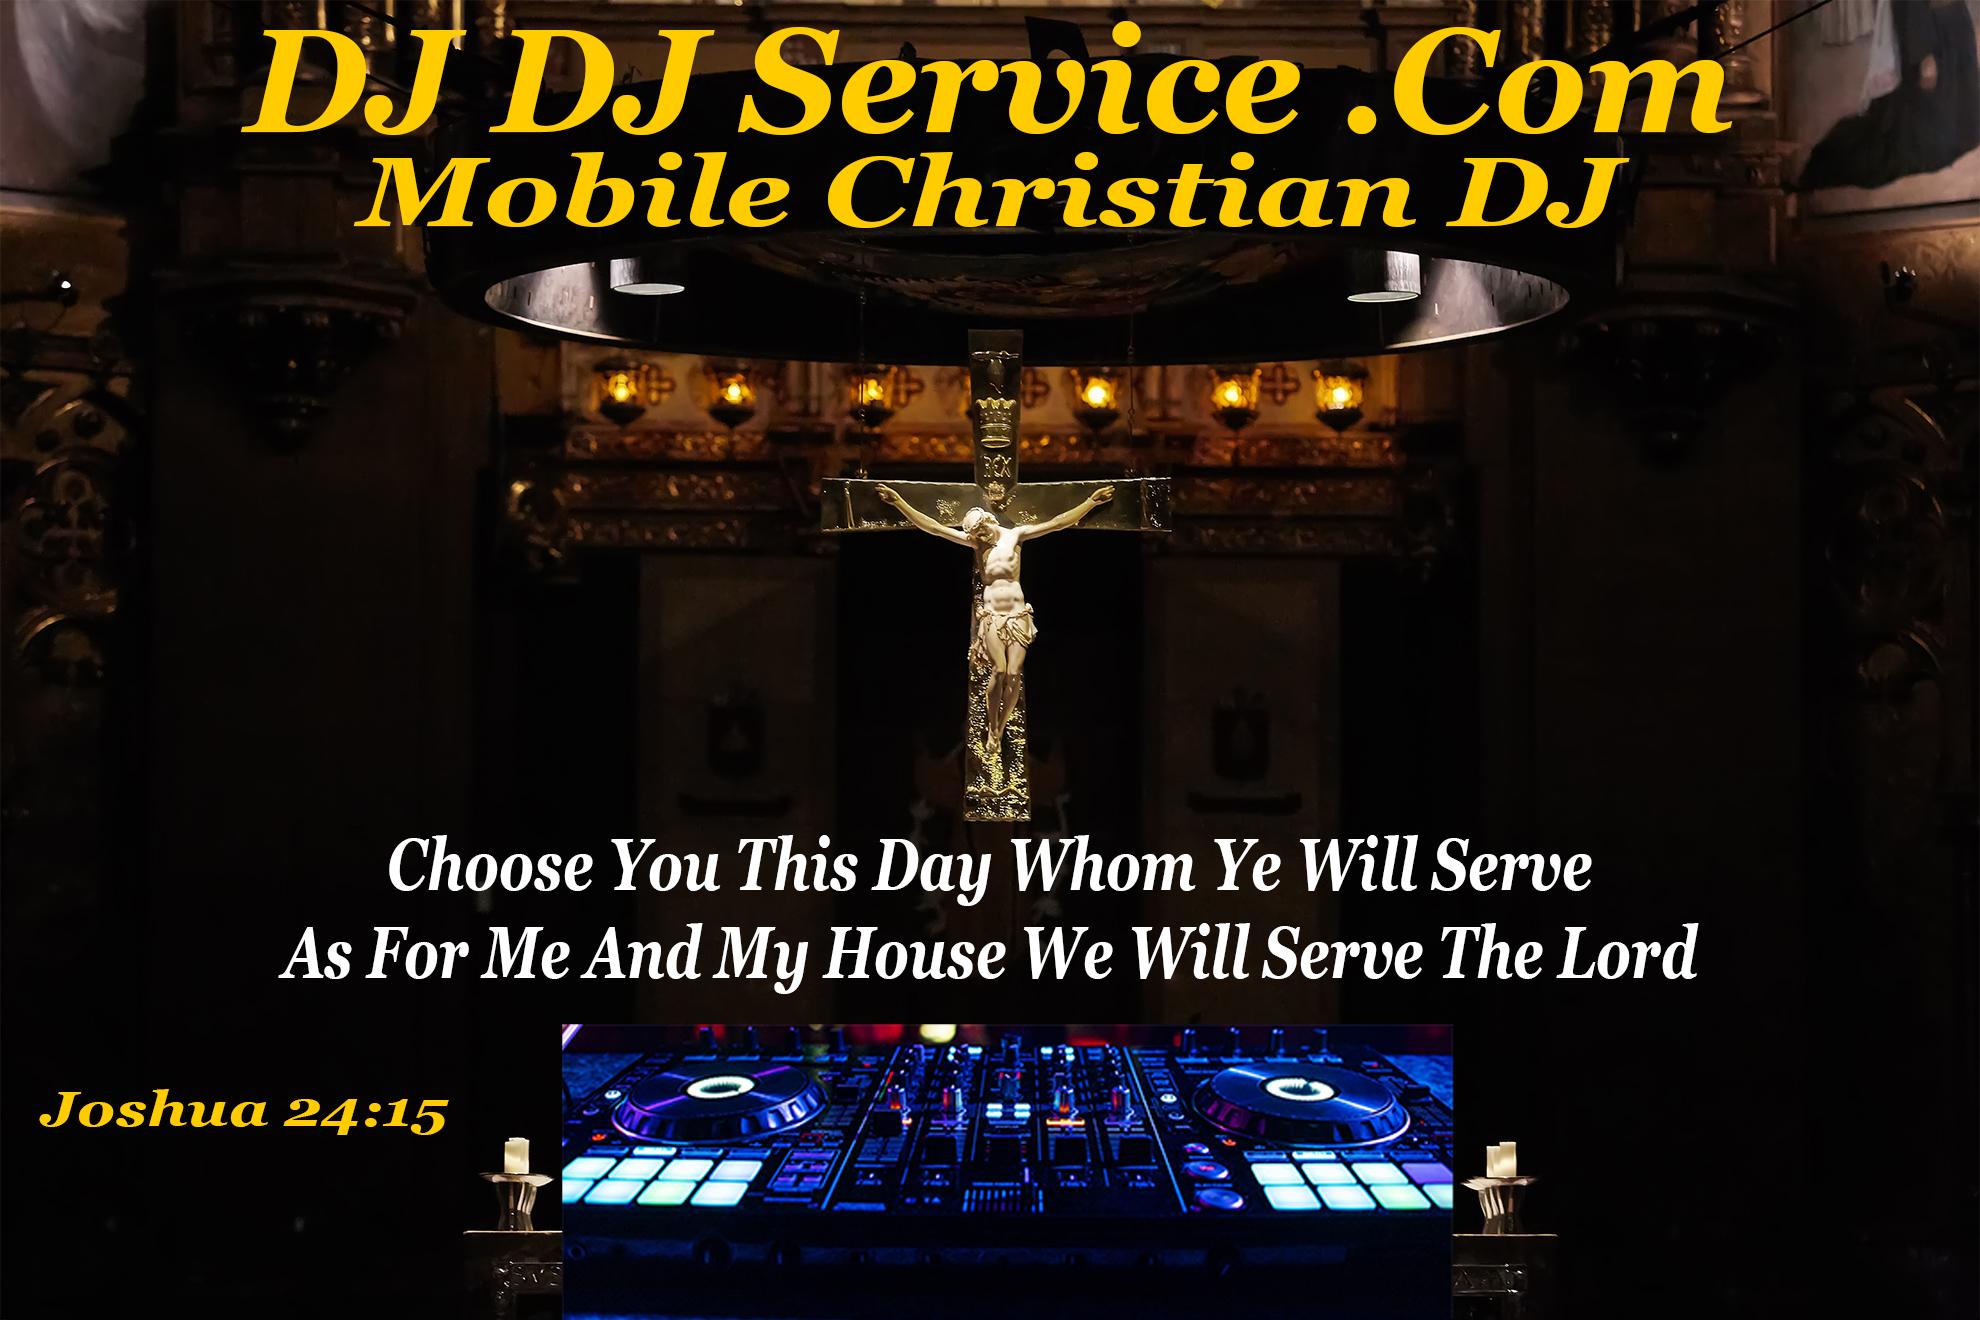 praise-and-worship-dj-dj-service-com-atlanta-ga-usa